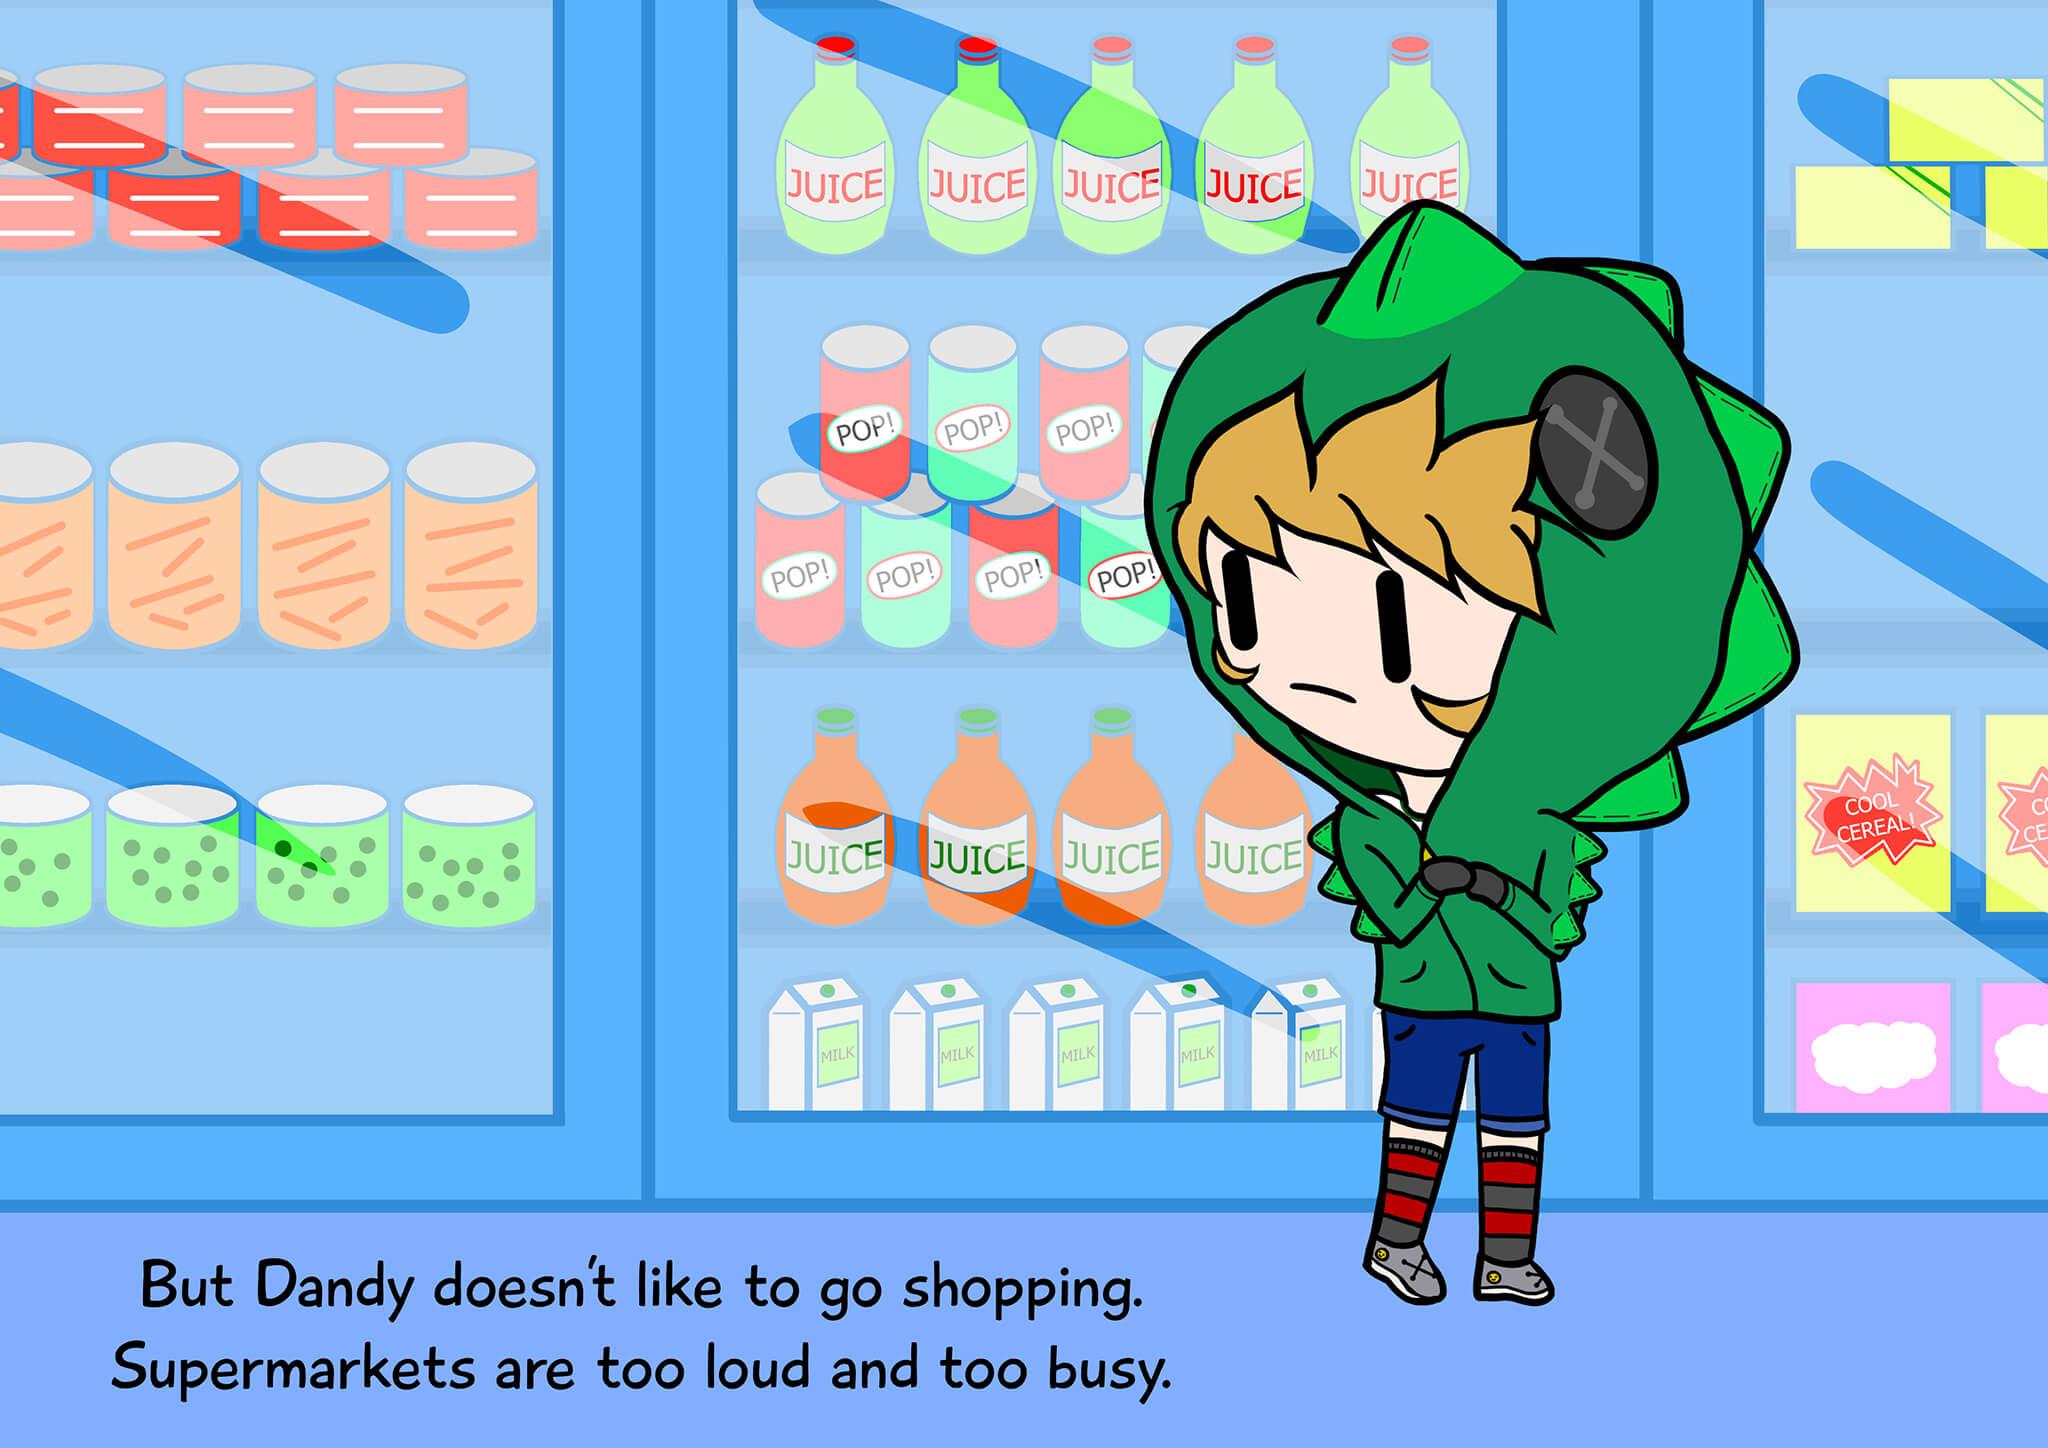 Maya_Tomlinson-Fine_and_Dandy_Supermarket